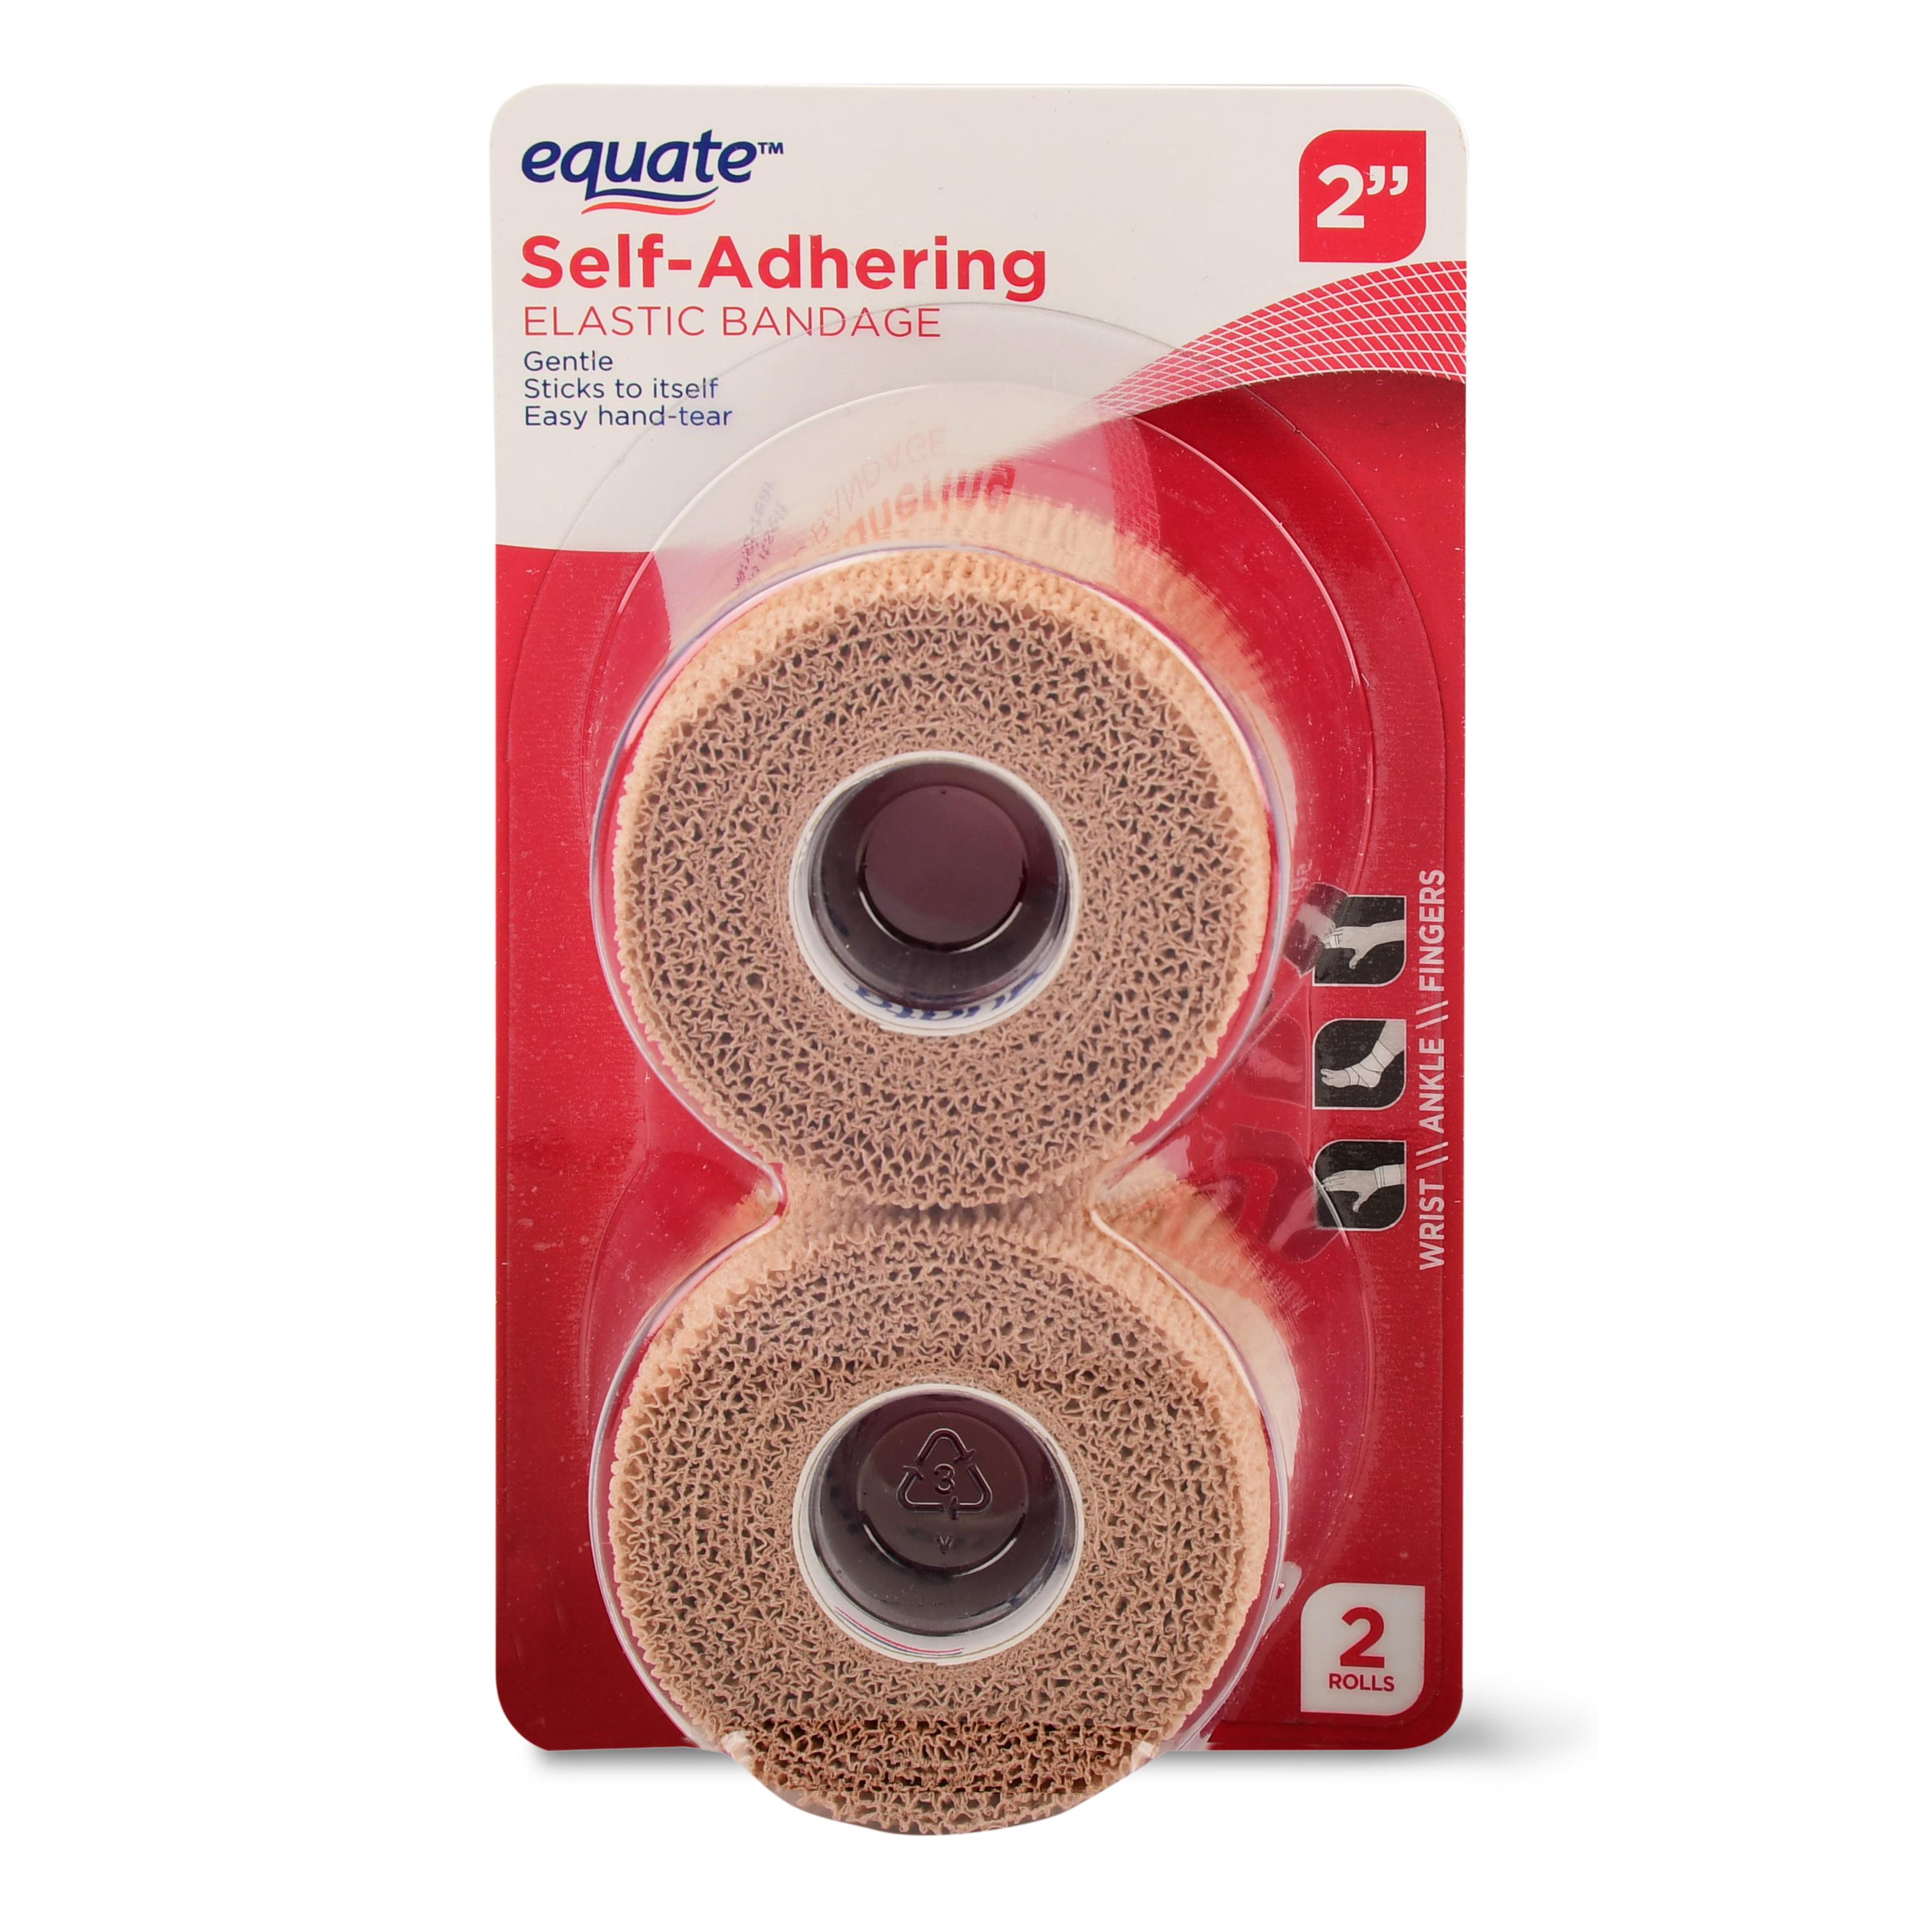 Equate Self Adhering 2 Elastic Bandages 2 Count Walmart Com